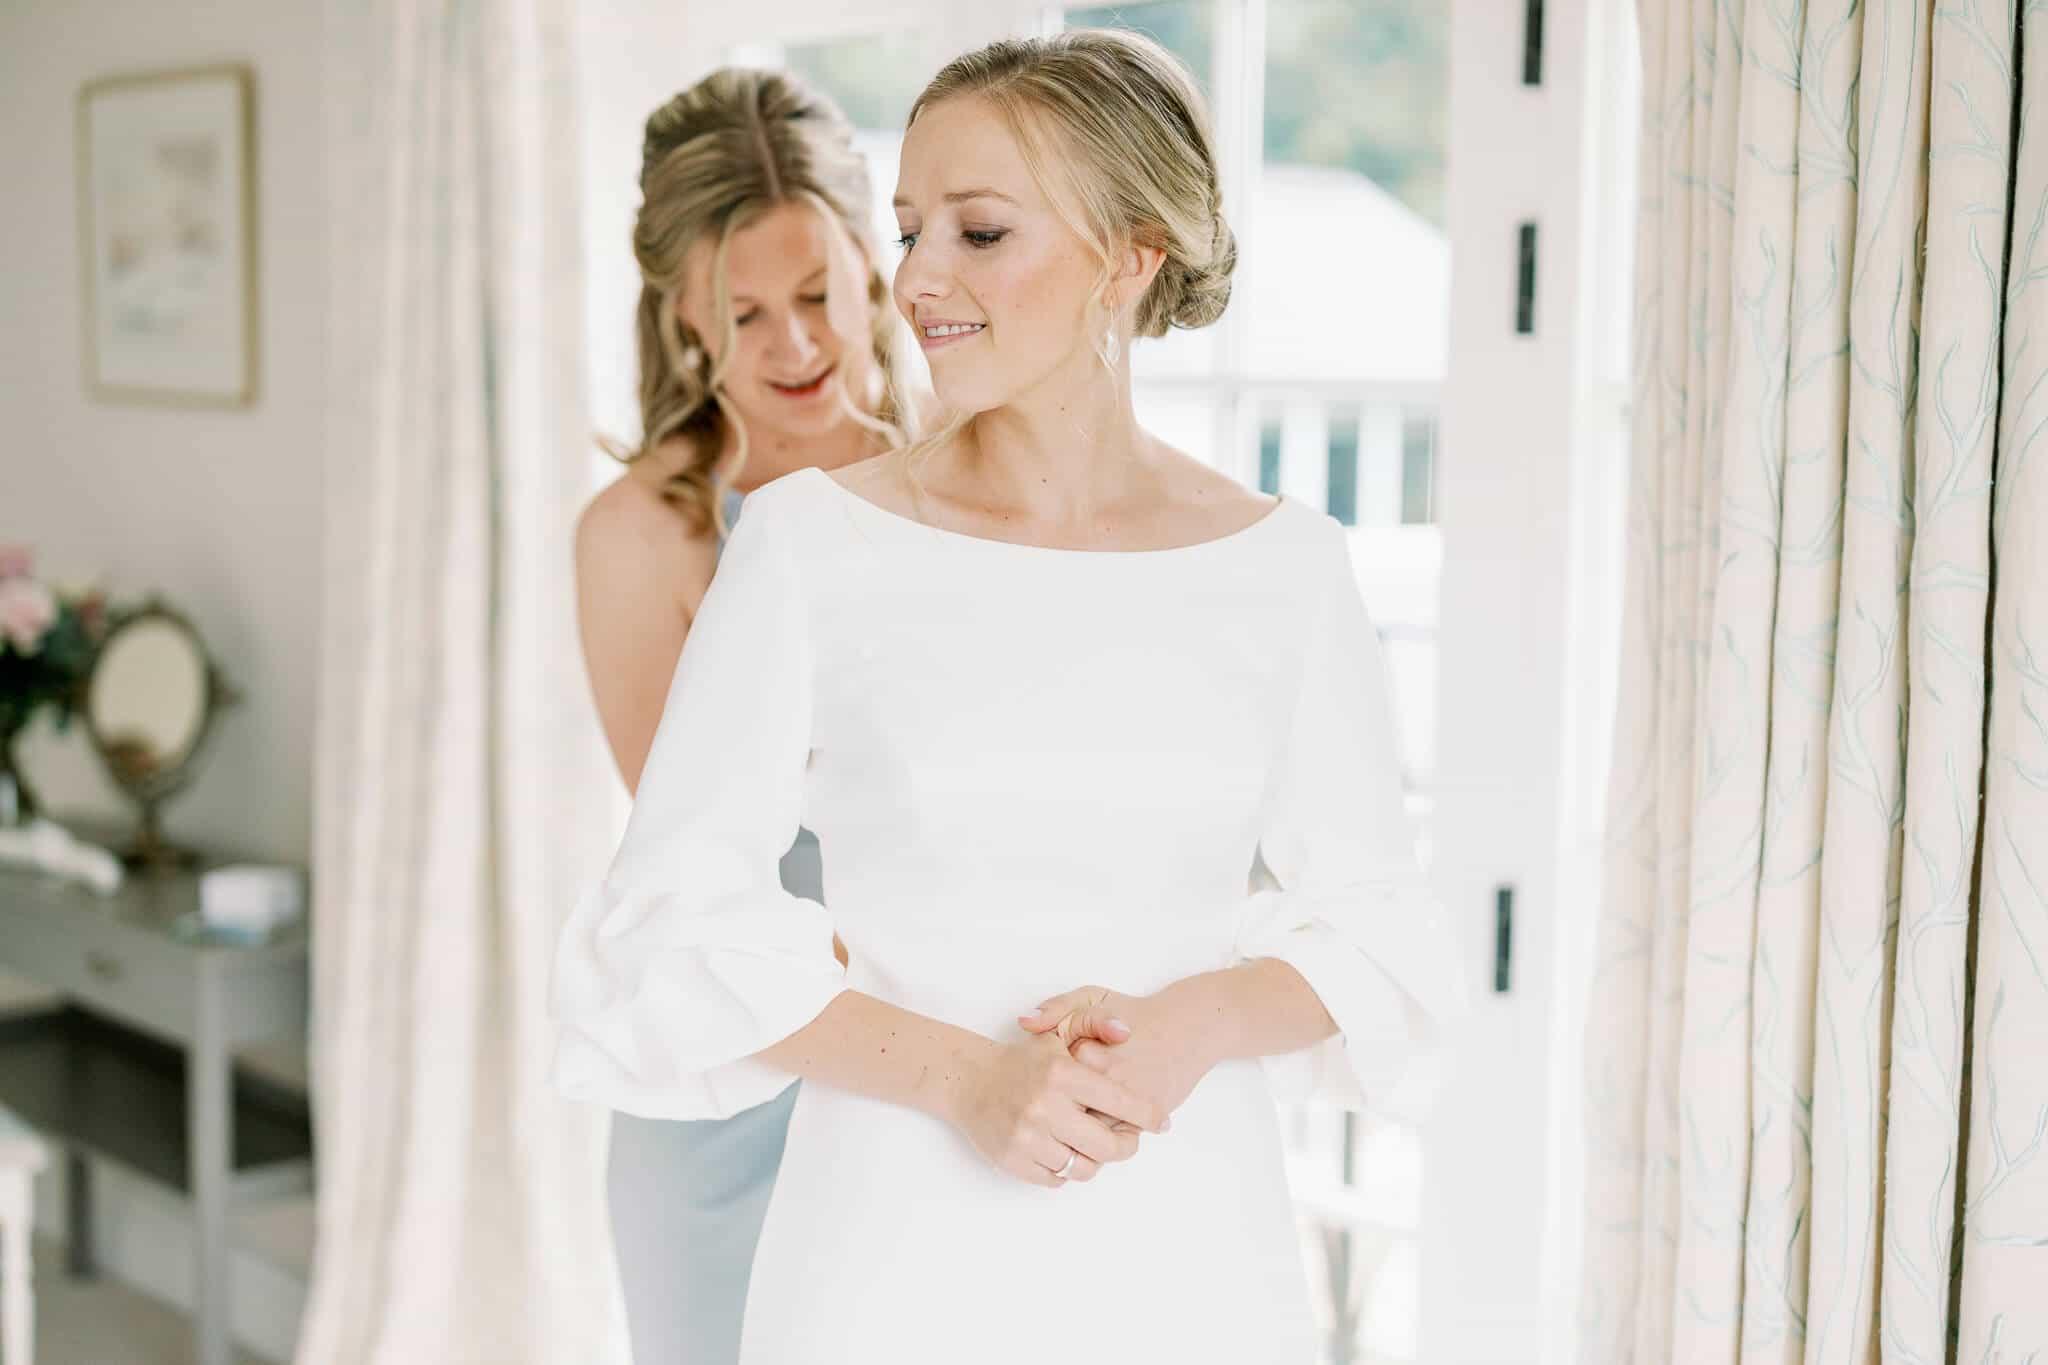 Lains Barn wedding photos of Bride in Suzanne Neville